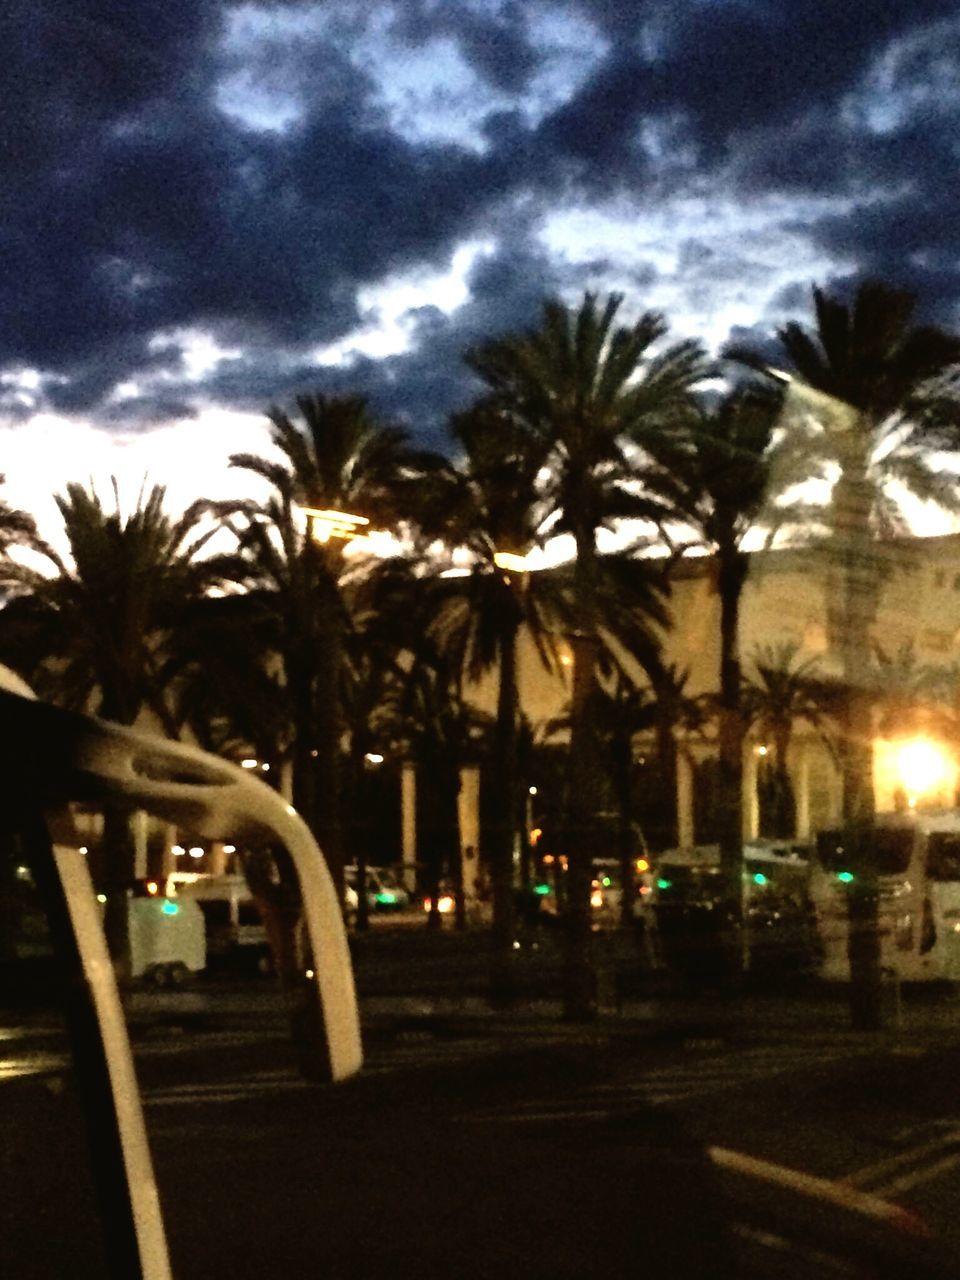 tree, sky, palm tree, cloud - sky, illuminated, outdoors, night, no people, street light, storm cloud, city, nature, close-up